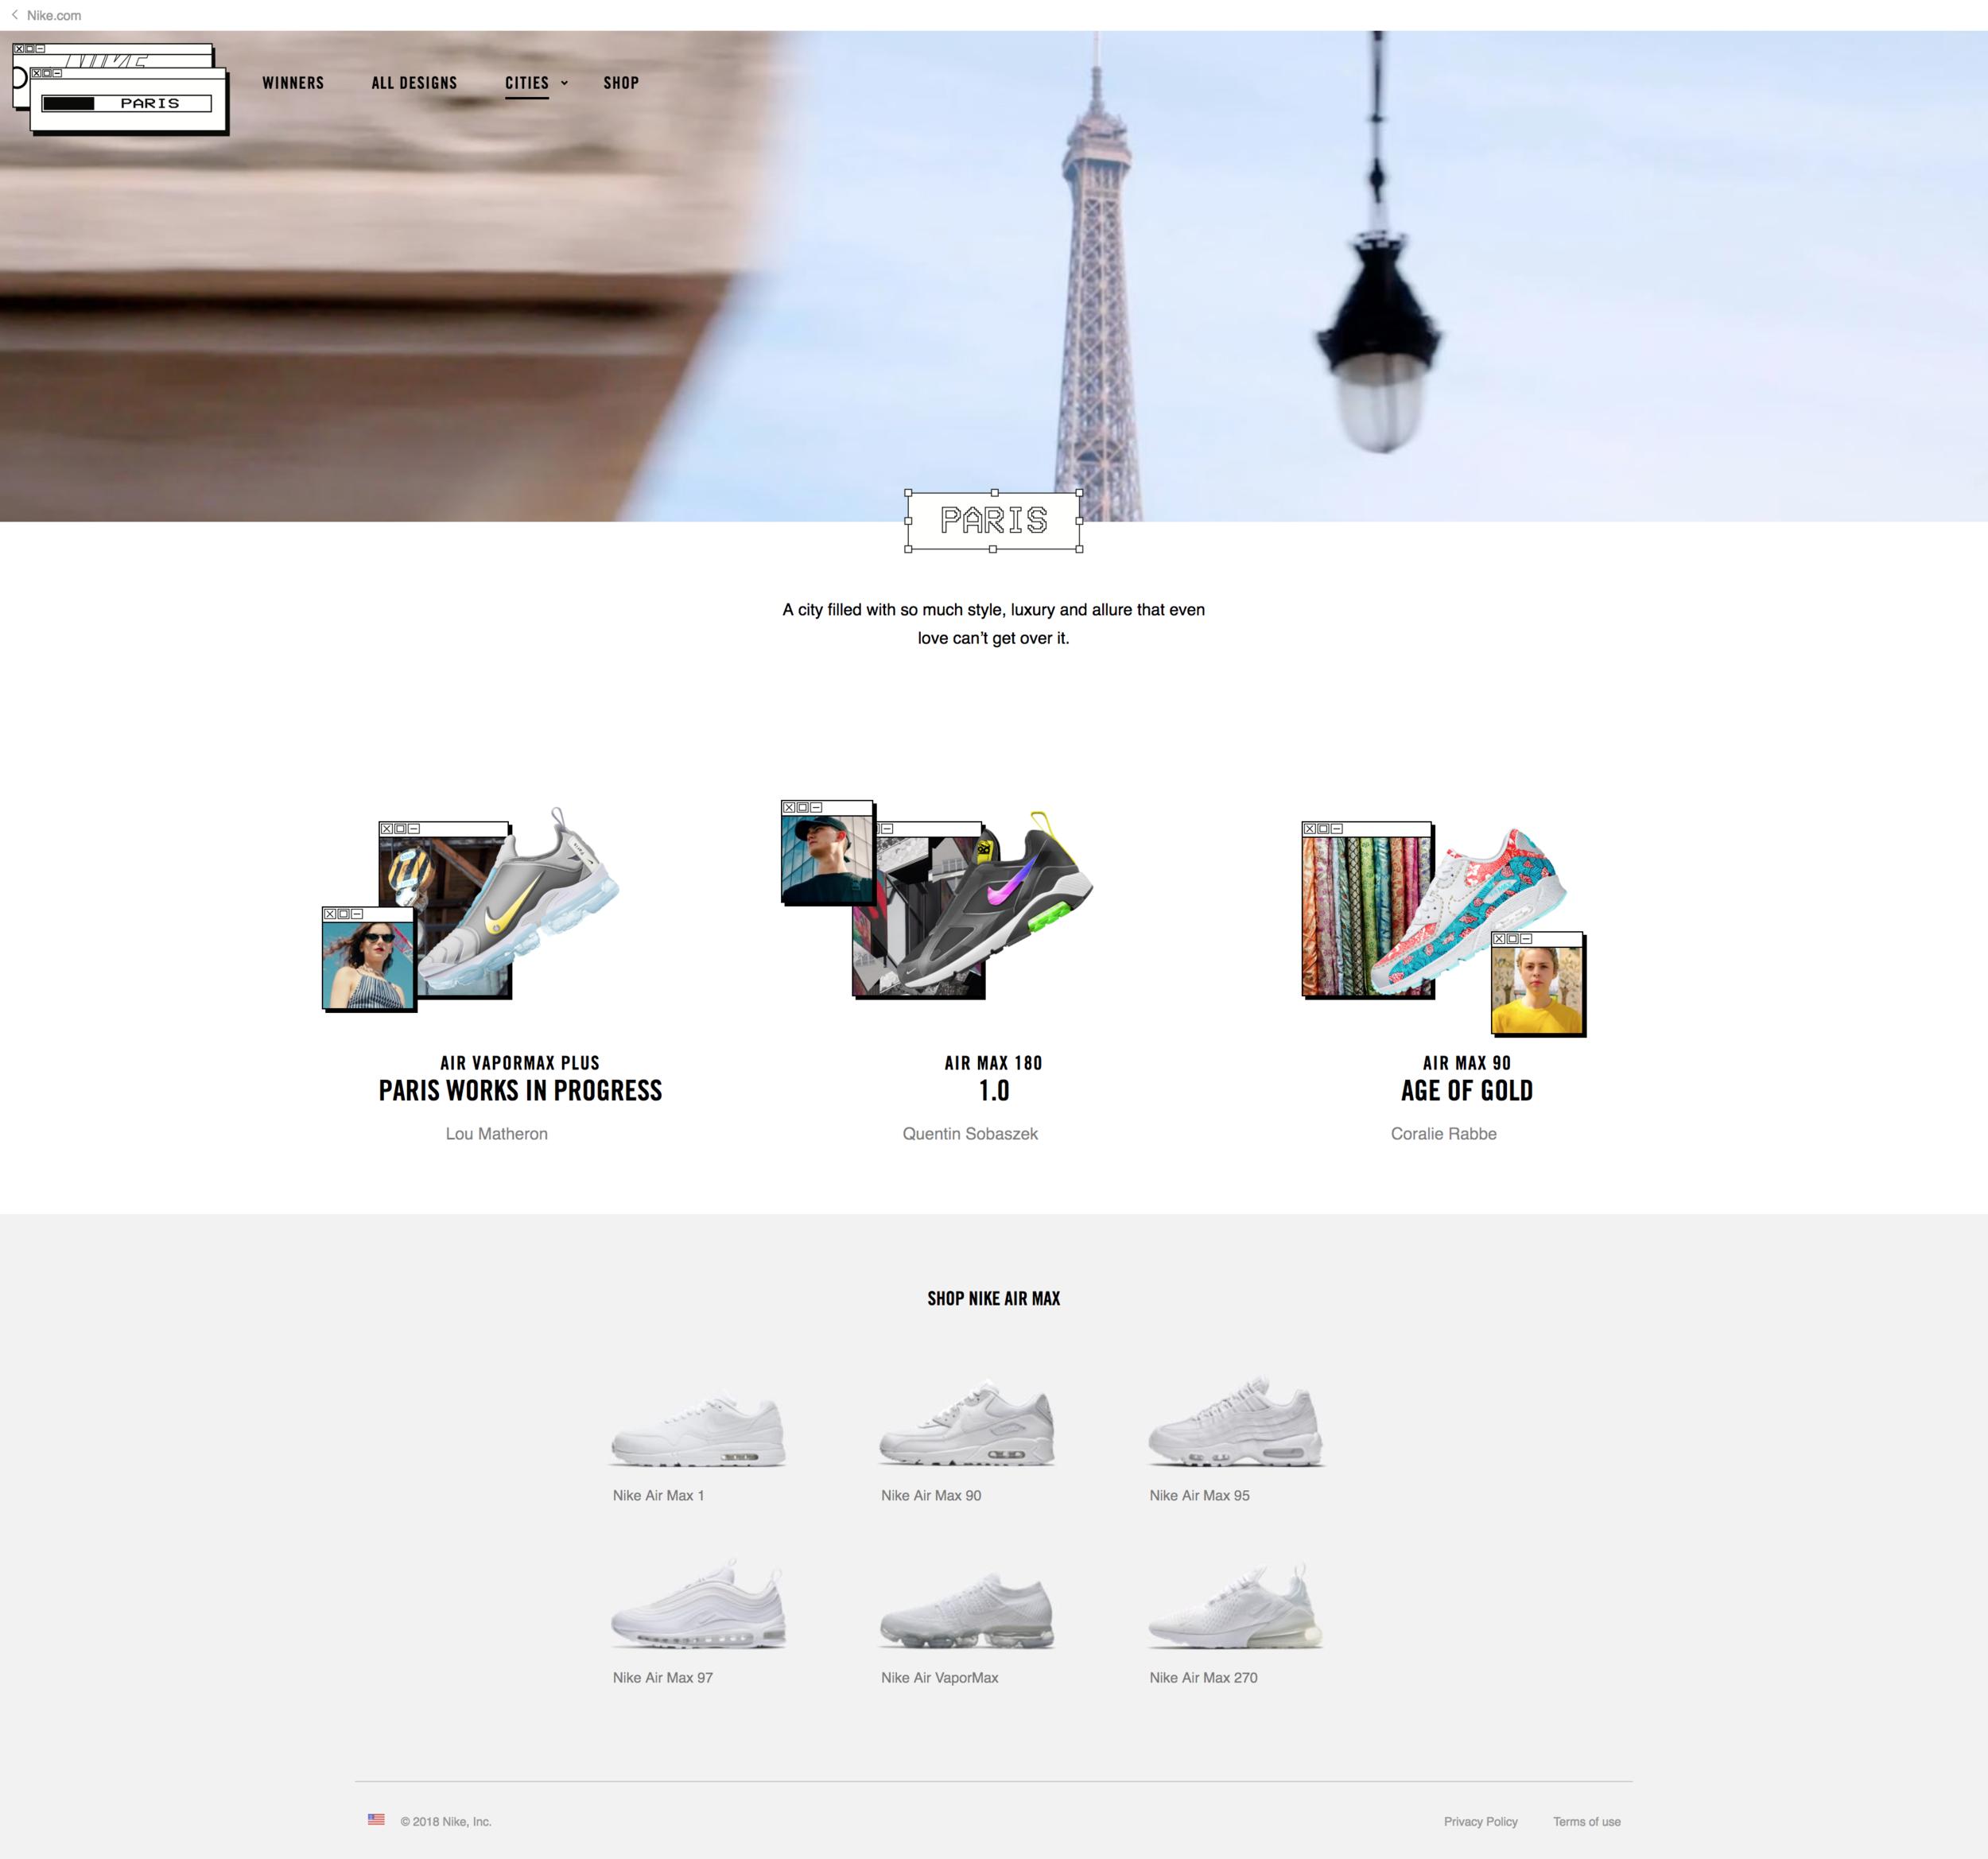 screencapture-onair-nike-city-paris-2018-08-09-13_20_21.png